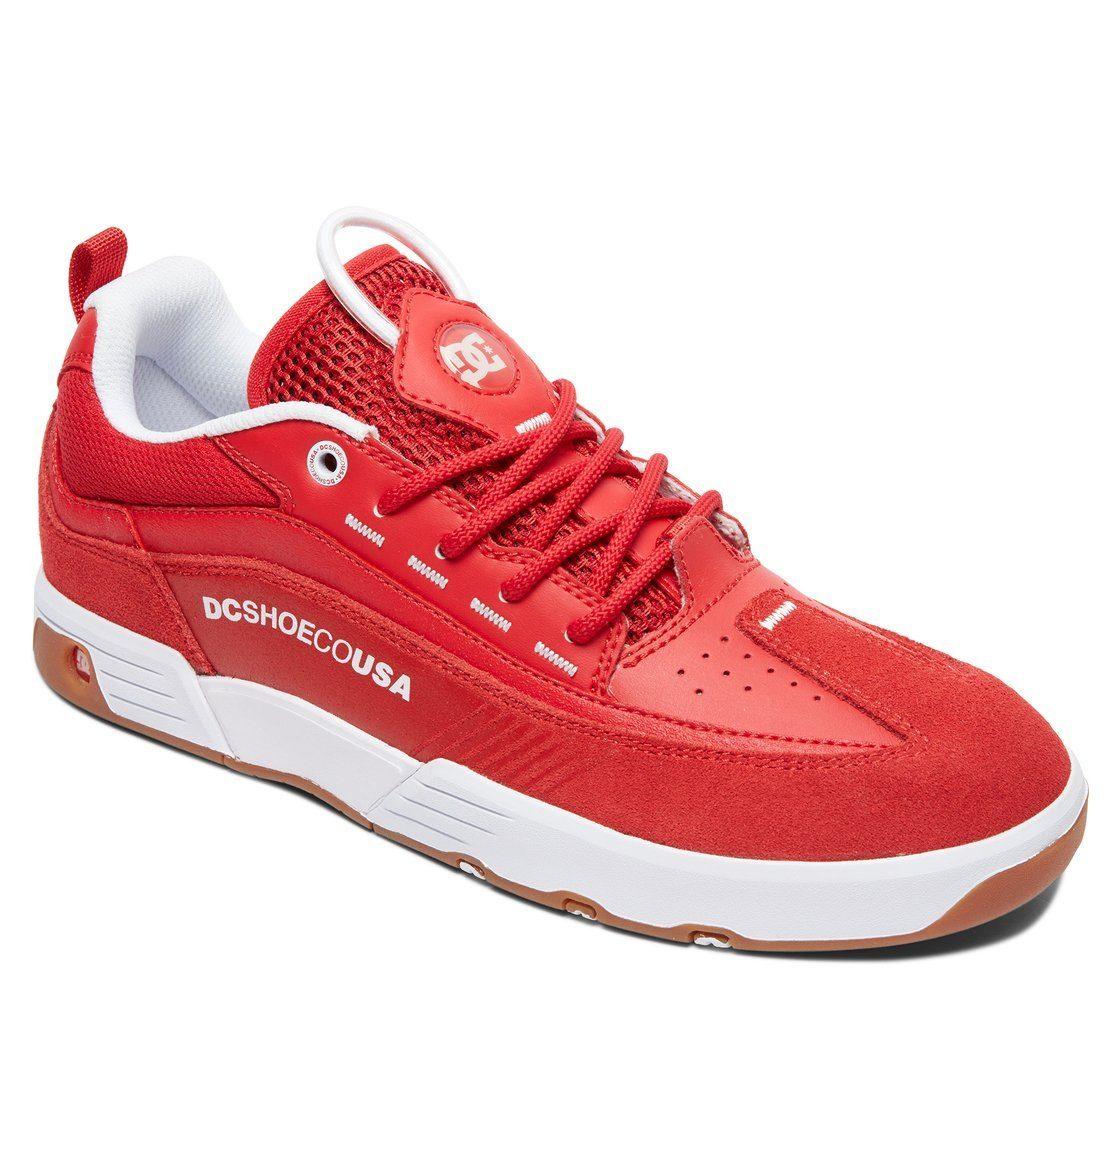 nr Shoes Kaufen Online 98 1832794599 Legacy Artikel Slipper Dc Rot Slim 8WwqdxHXY